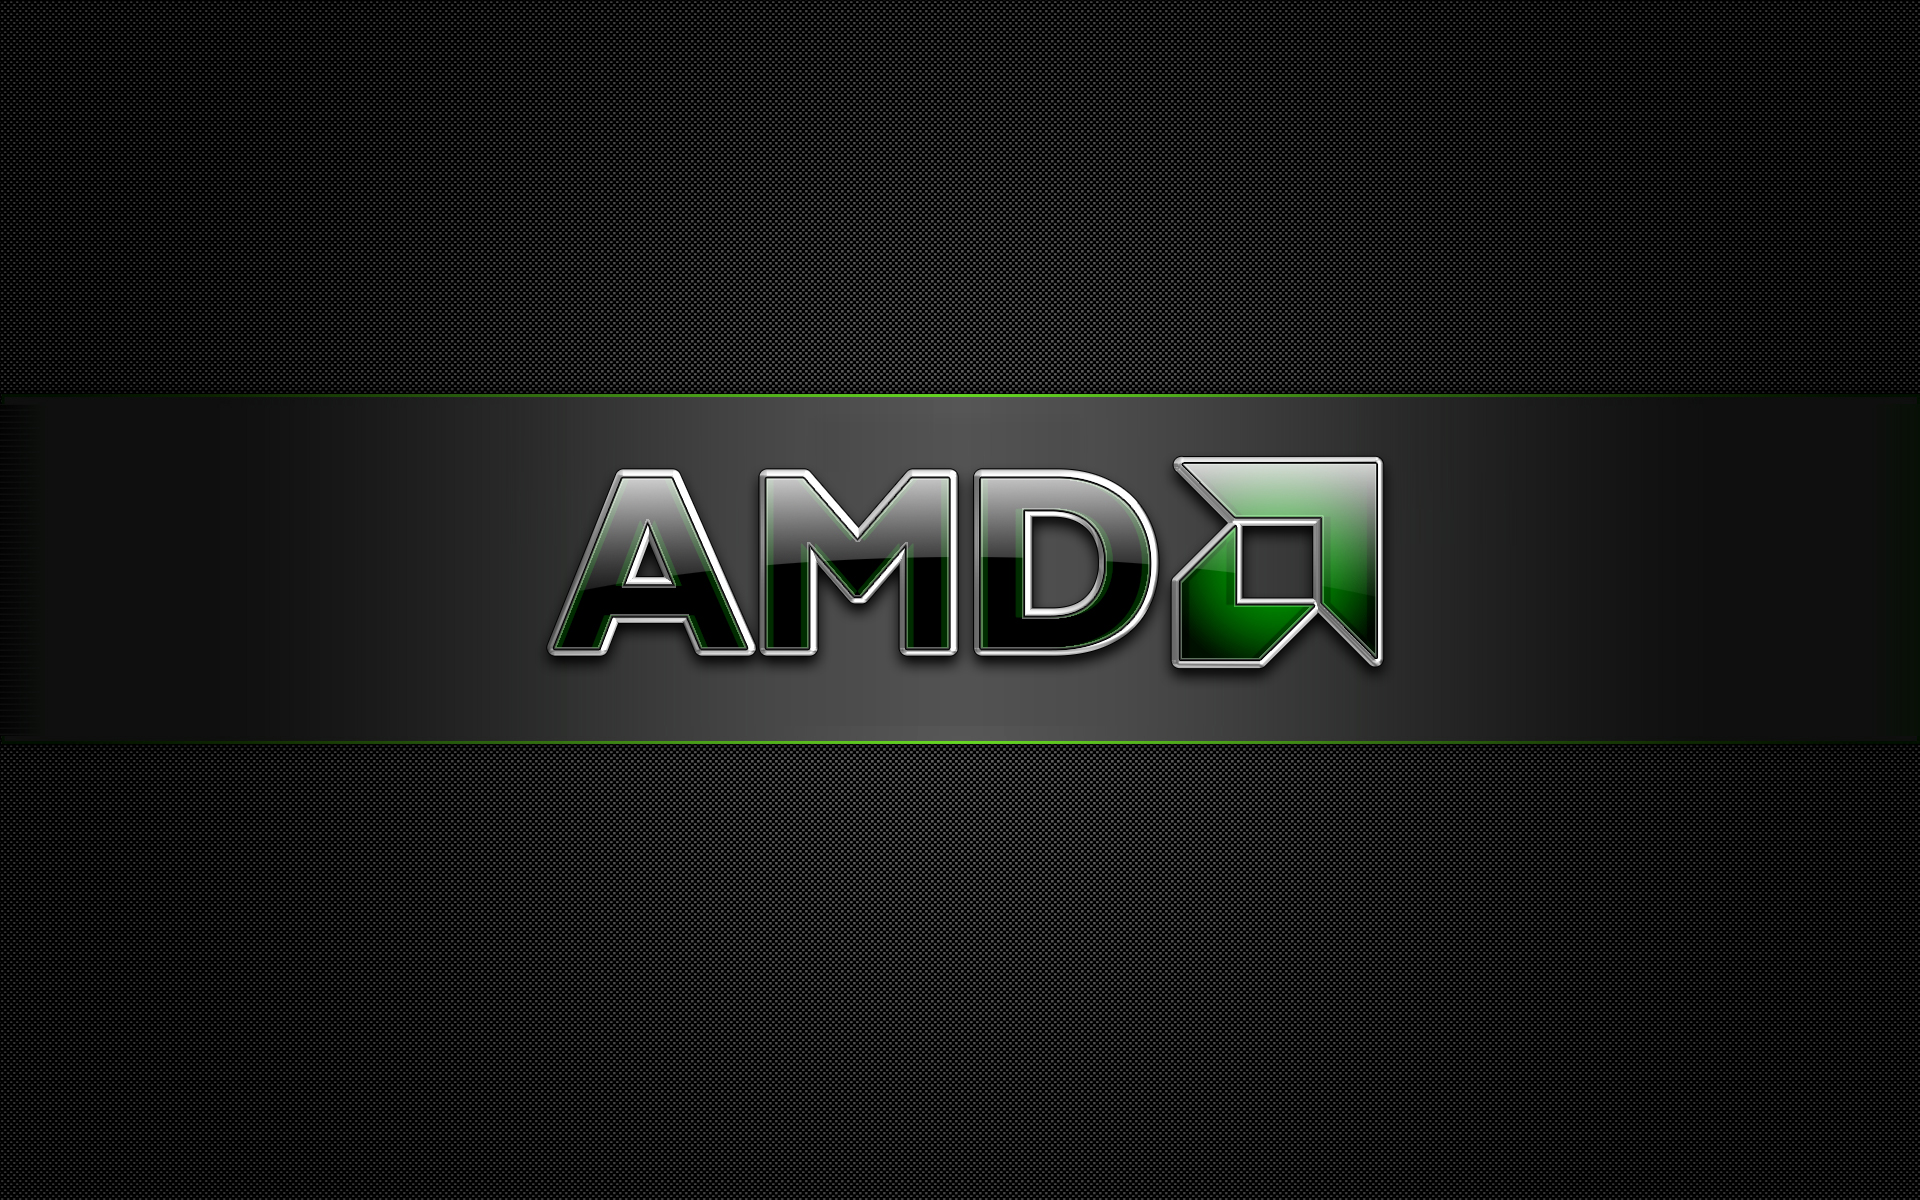 Revenue Estimates Analysis Advanced Micro Devices, Inc. (AMD)